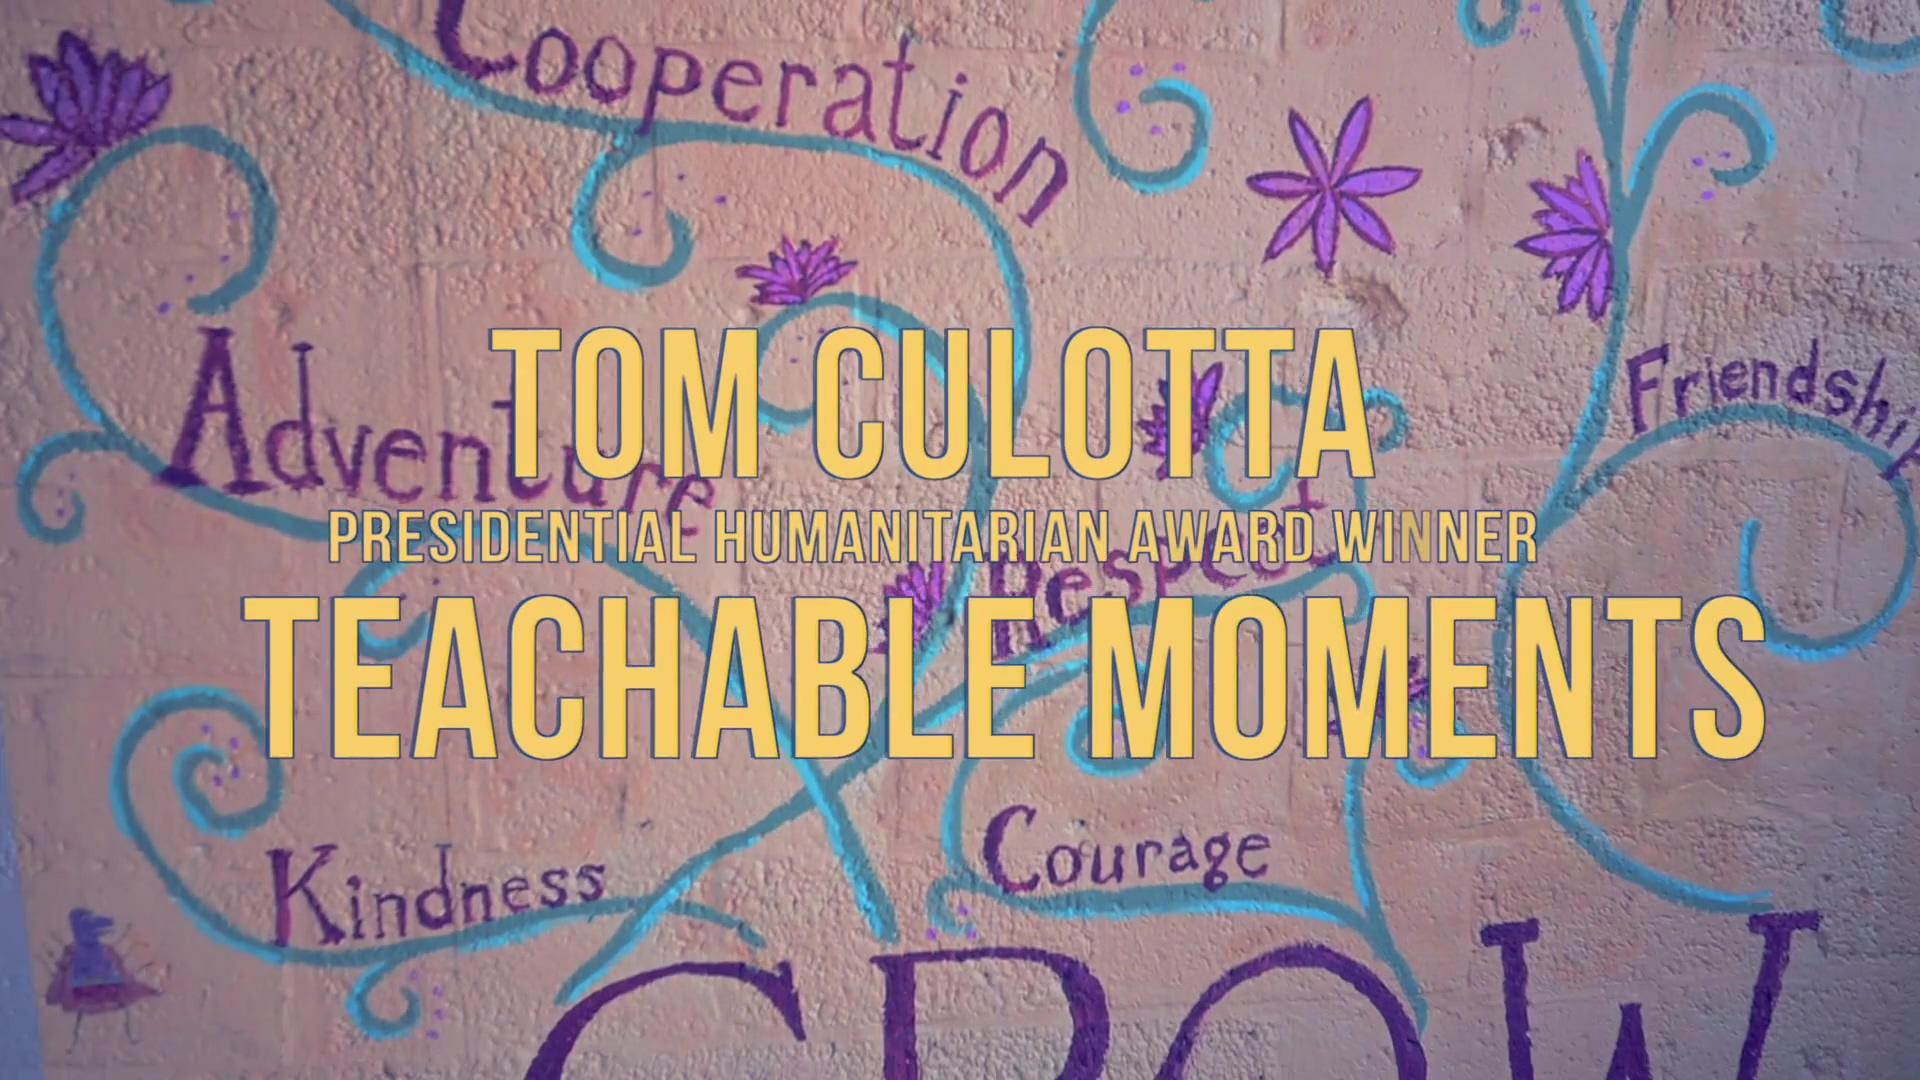 Tom Culotta Teachable Moments